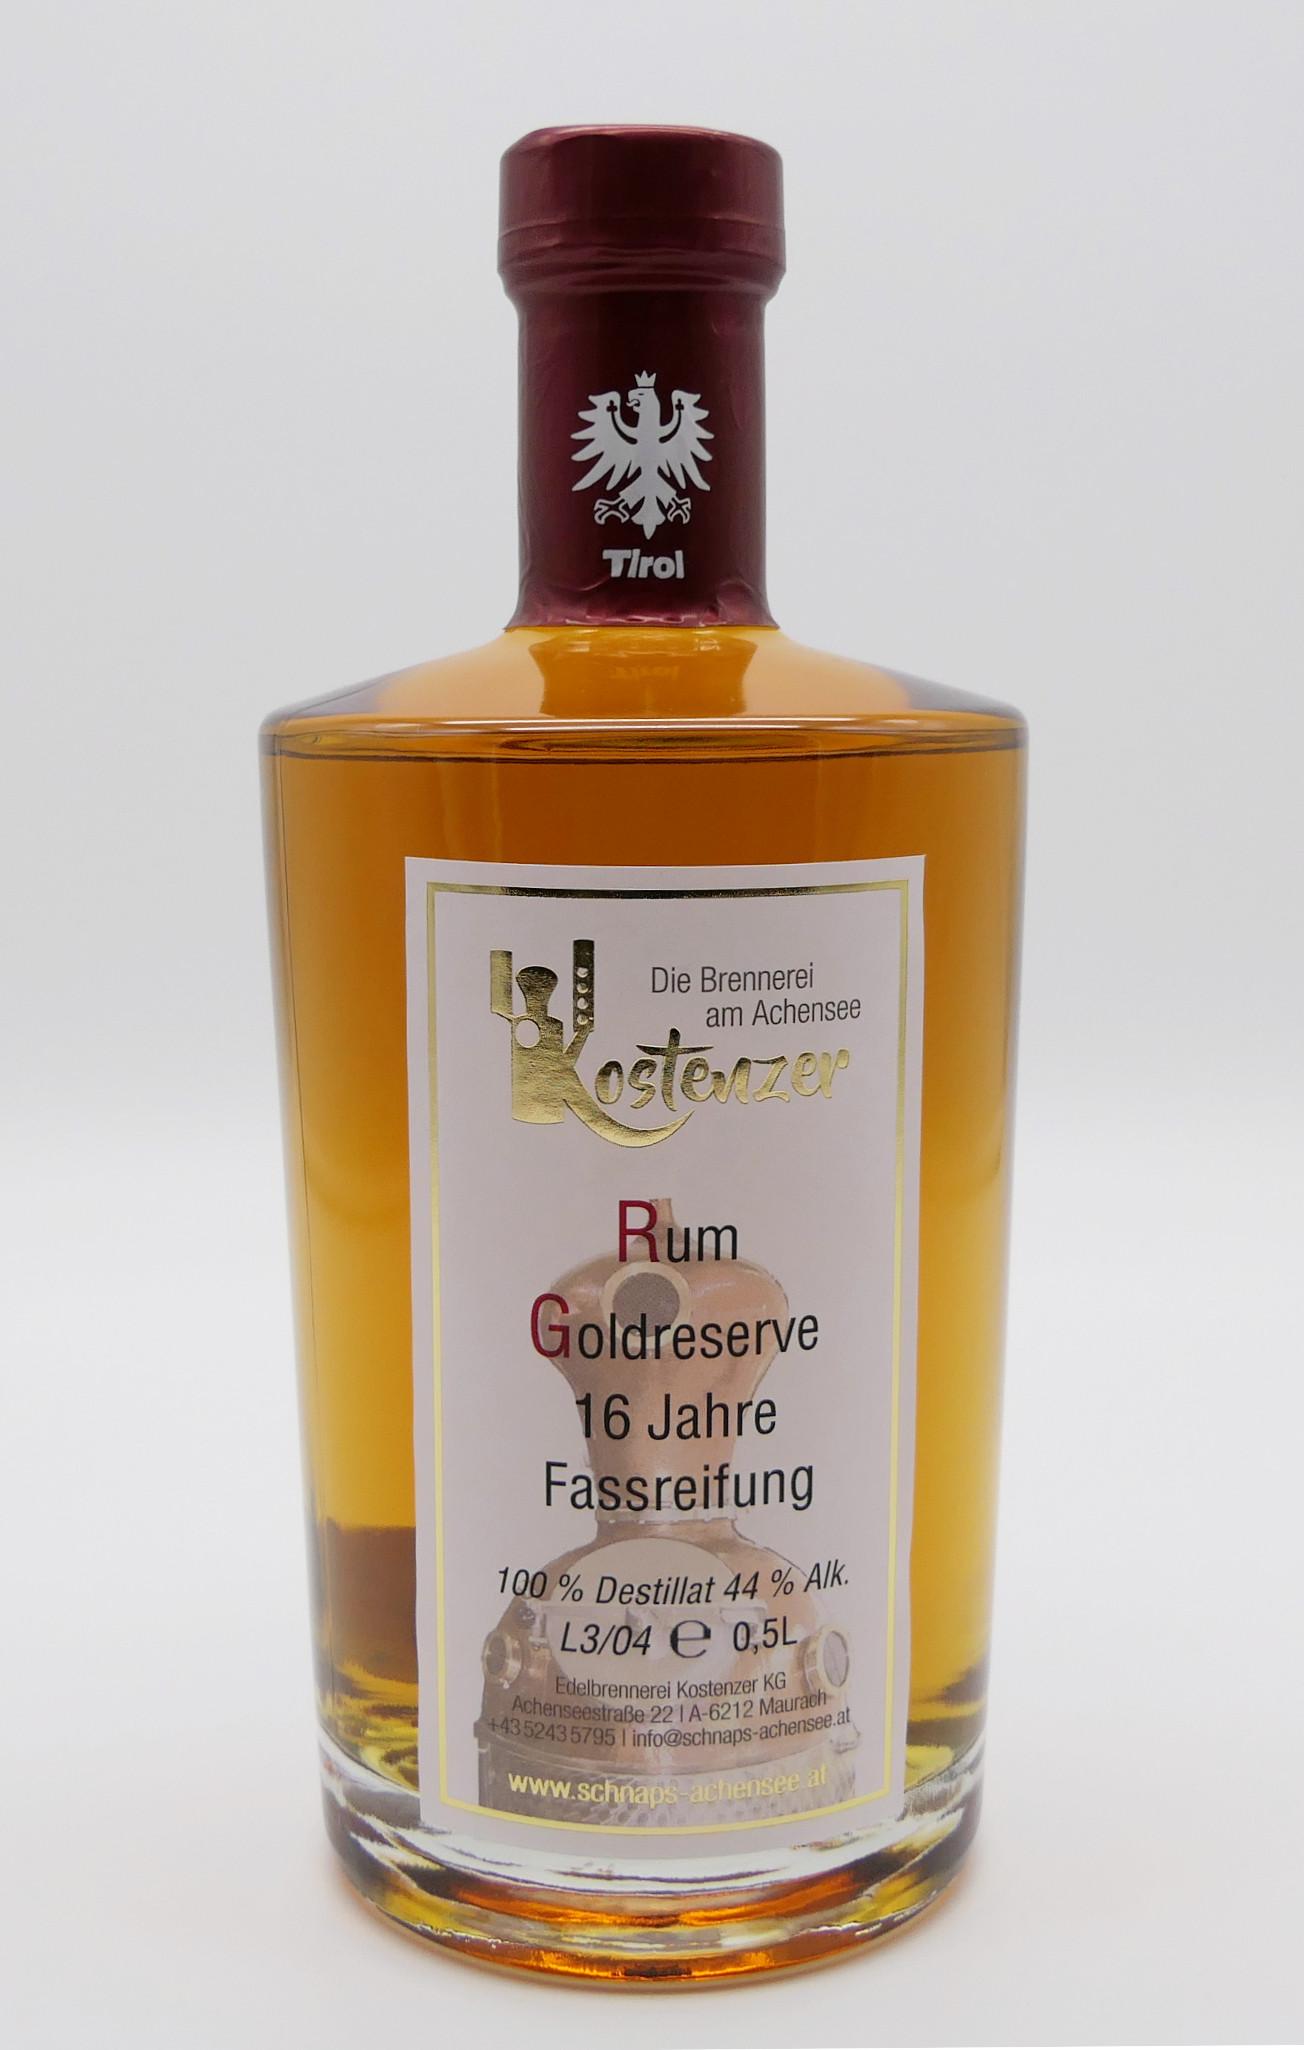 Rum Goldreserve 16 Jahre